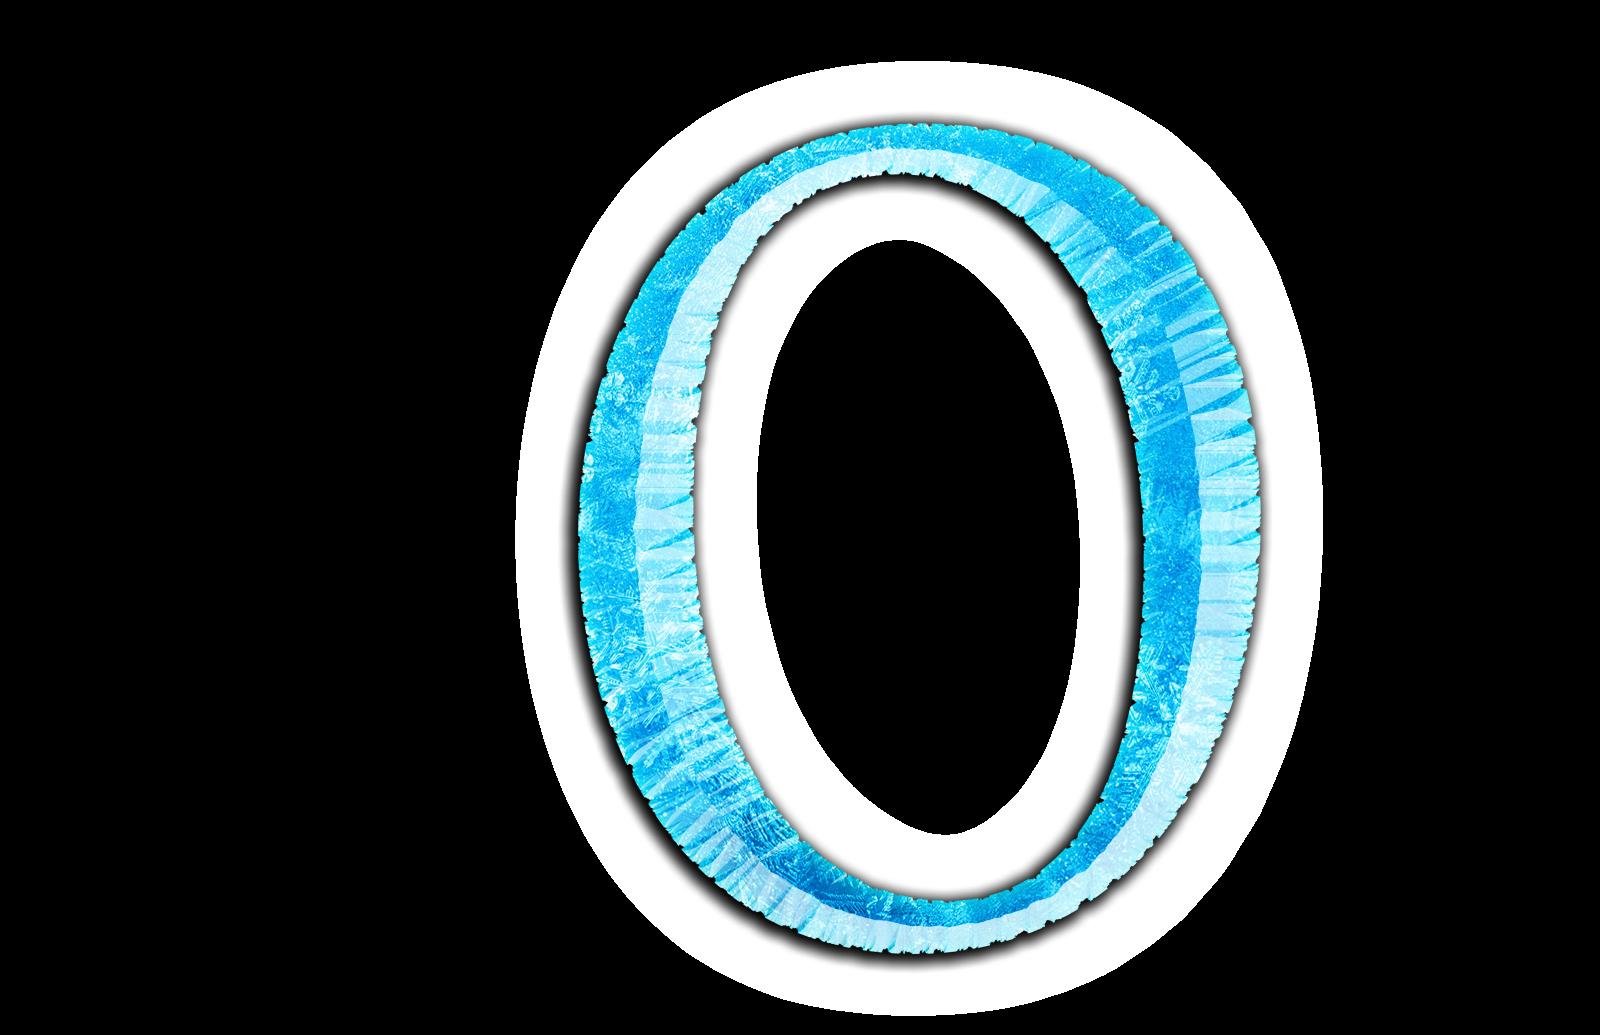 oi o o Oo cd h- o o h- σi oi oo st co o si 4^ co ίo co oo oo si ^ ^ oo o 4^ cπ cd  co cd cd cd cd co cd co co co oi o o o cπ oi 00 si si si _ oi 4^ o oi  oo.